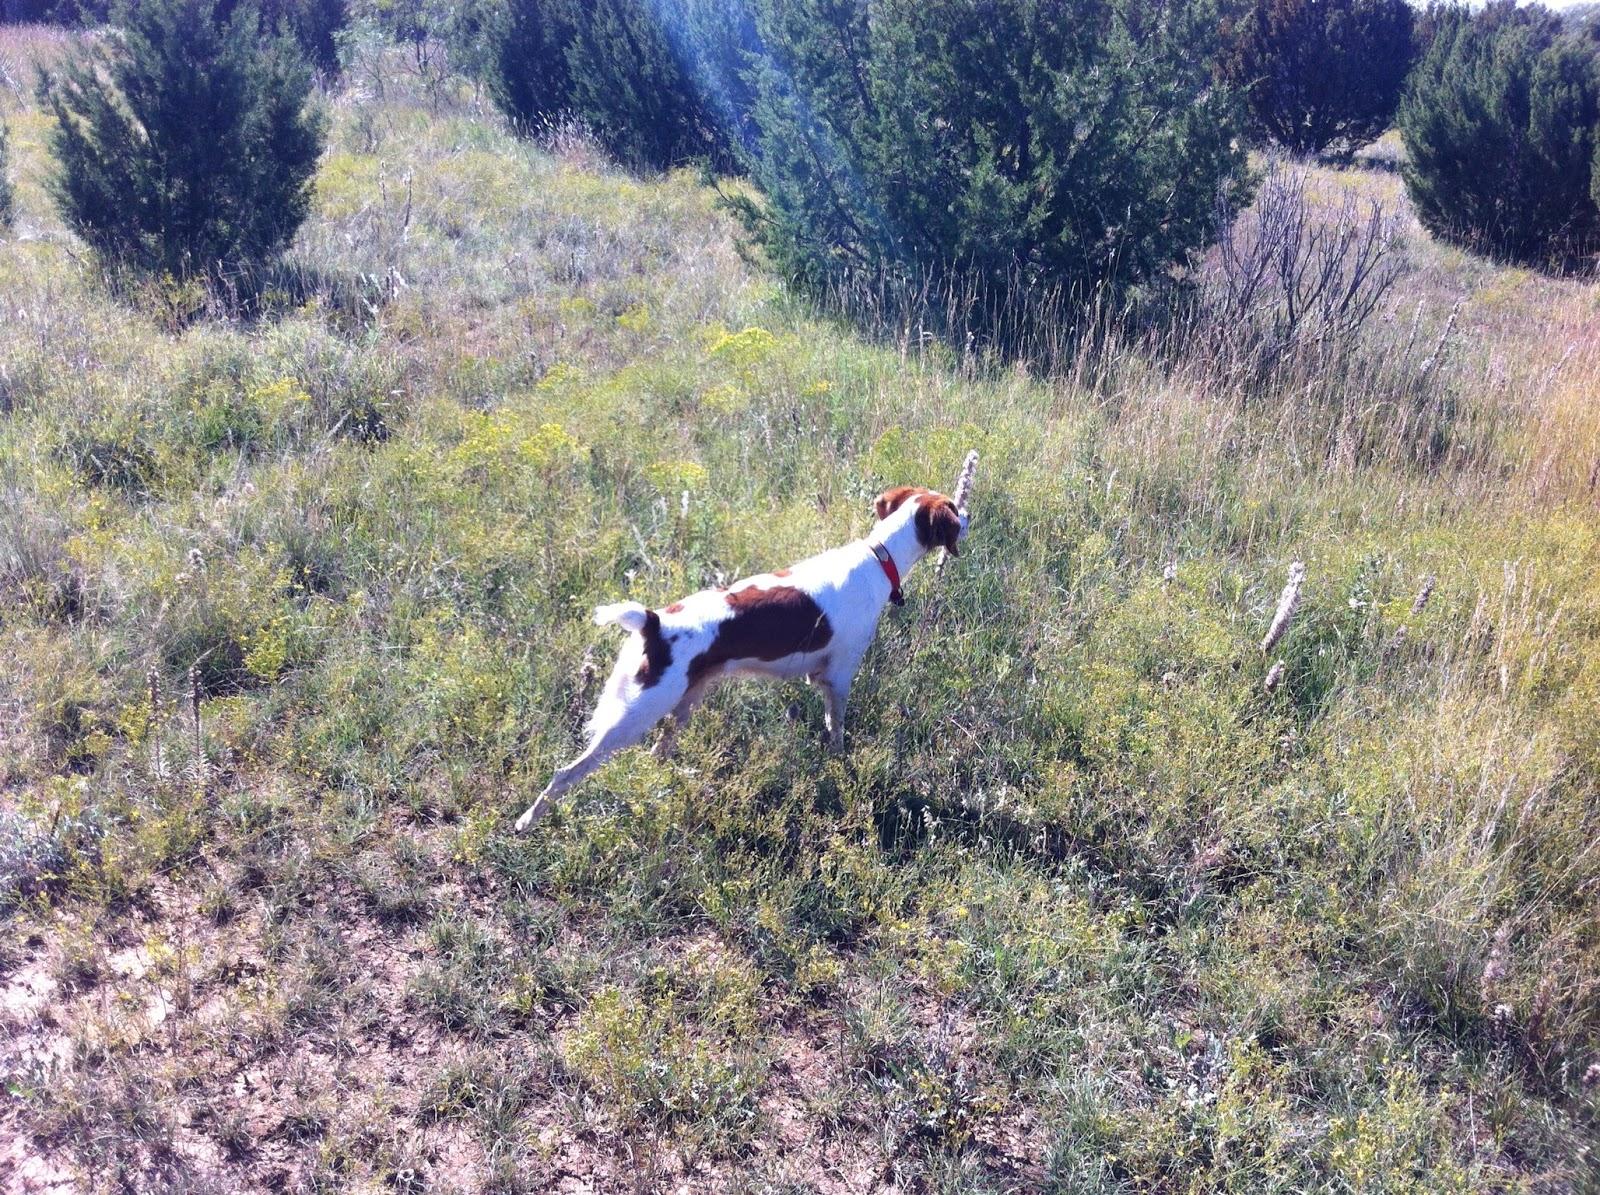 How Do I Train My Dog To Bird Hunt